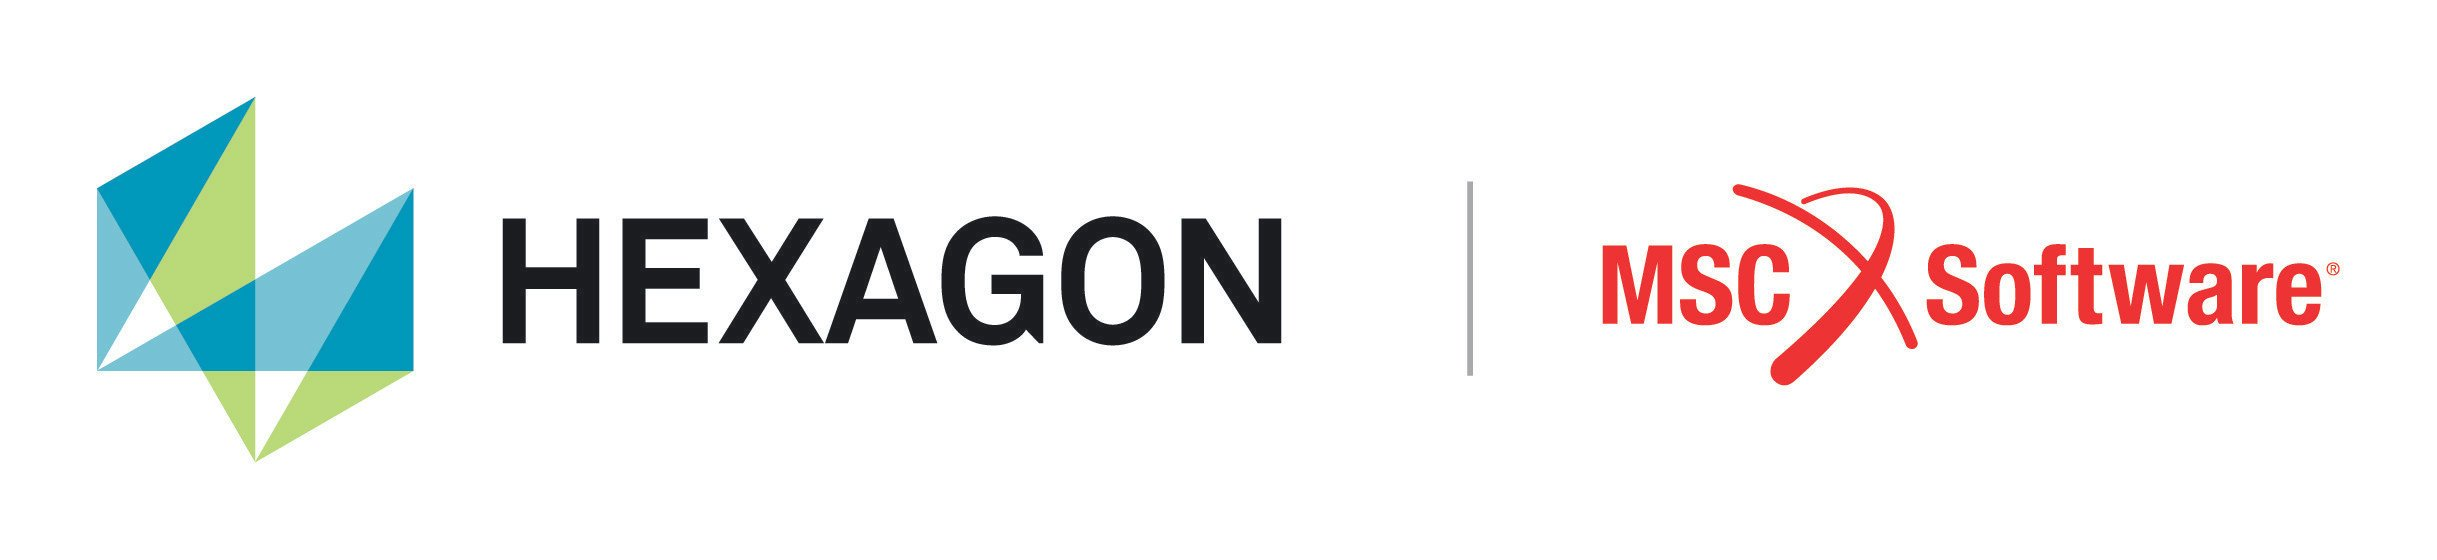 Hexagon MSC Software